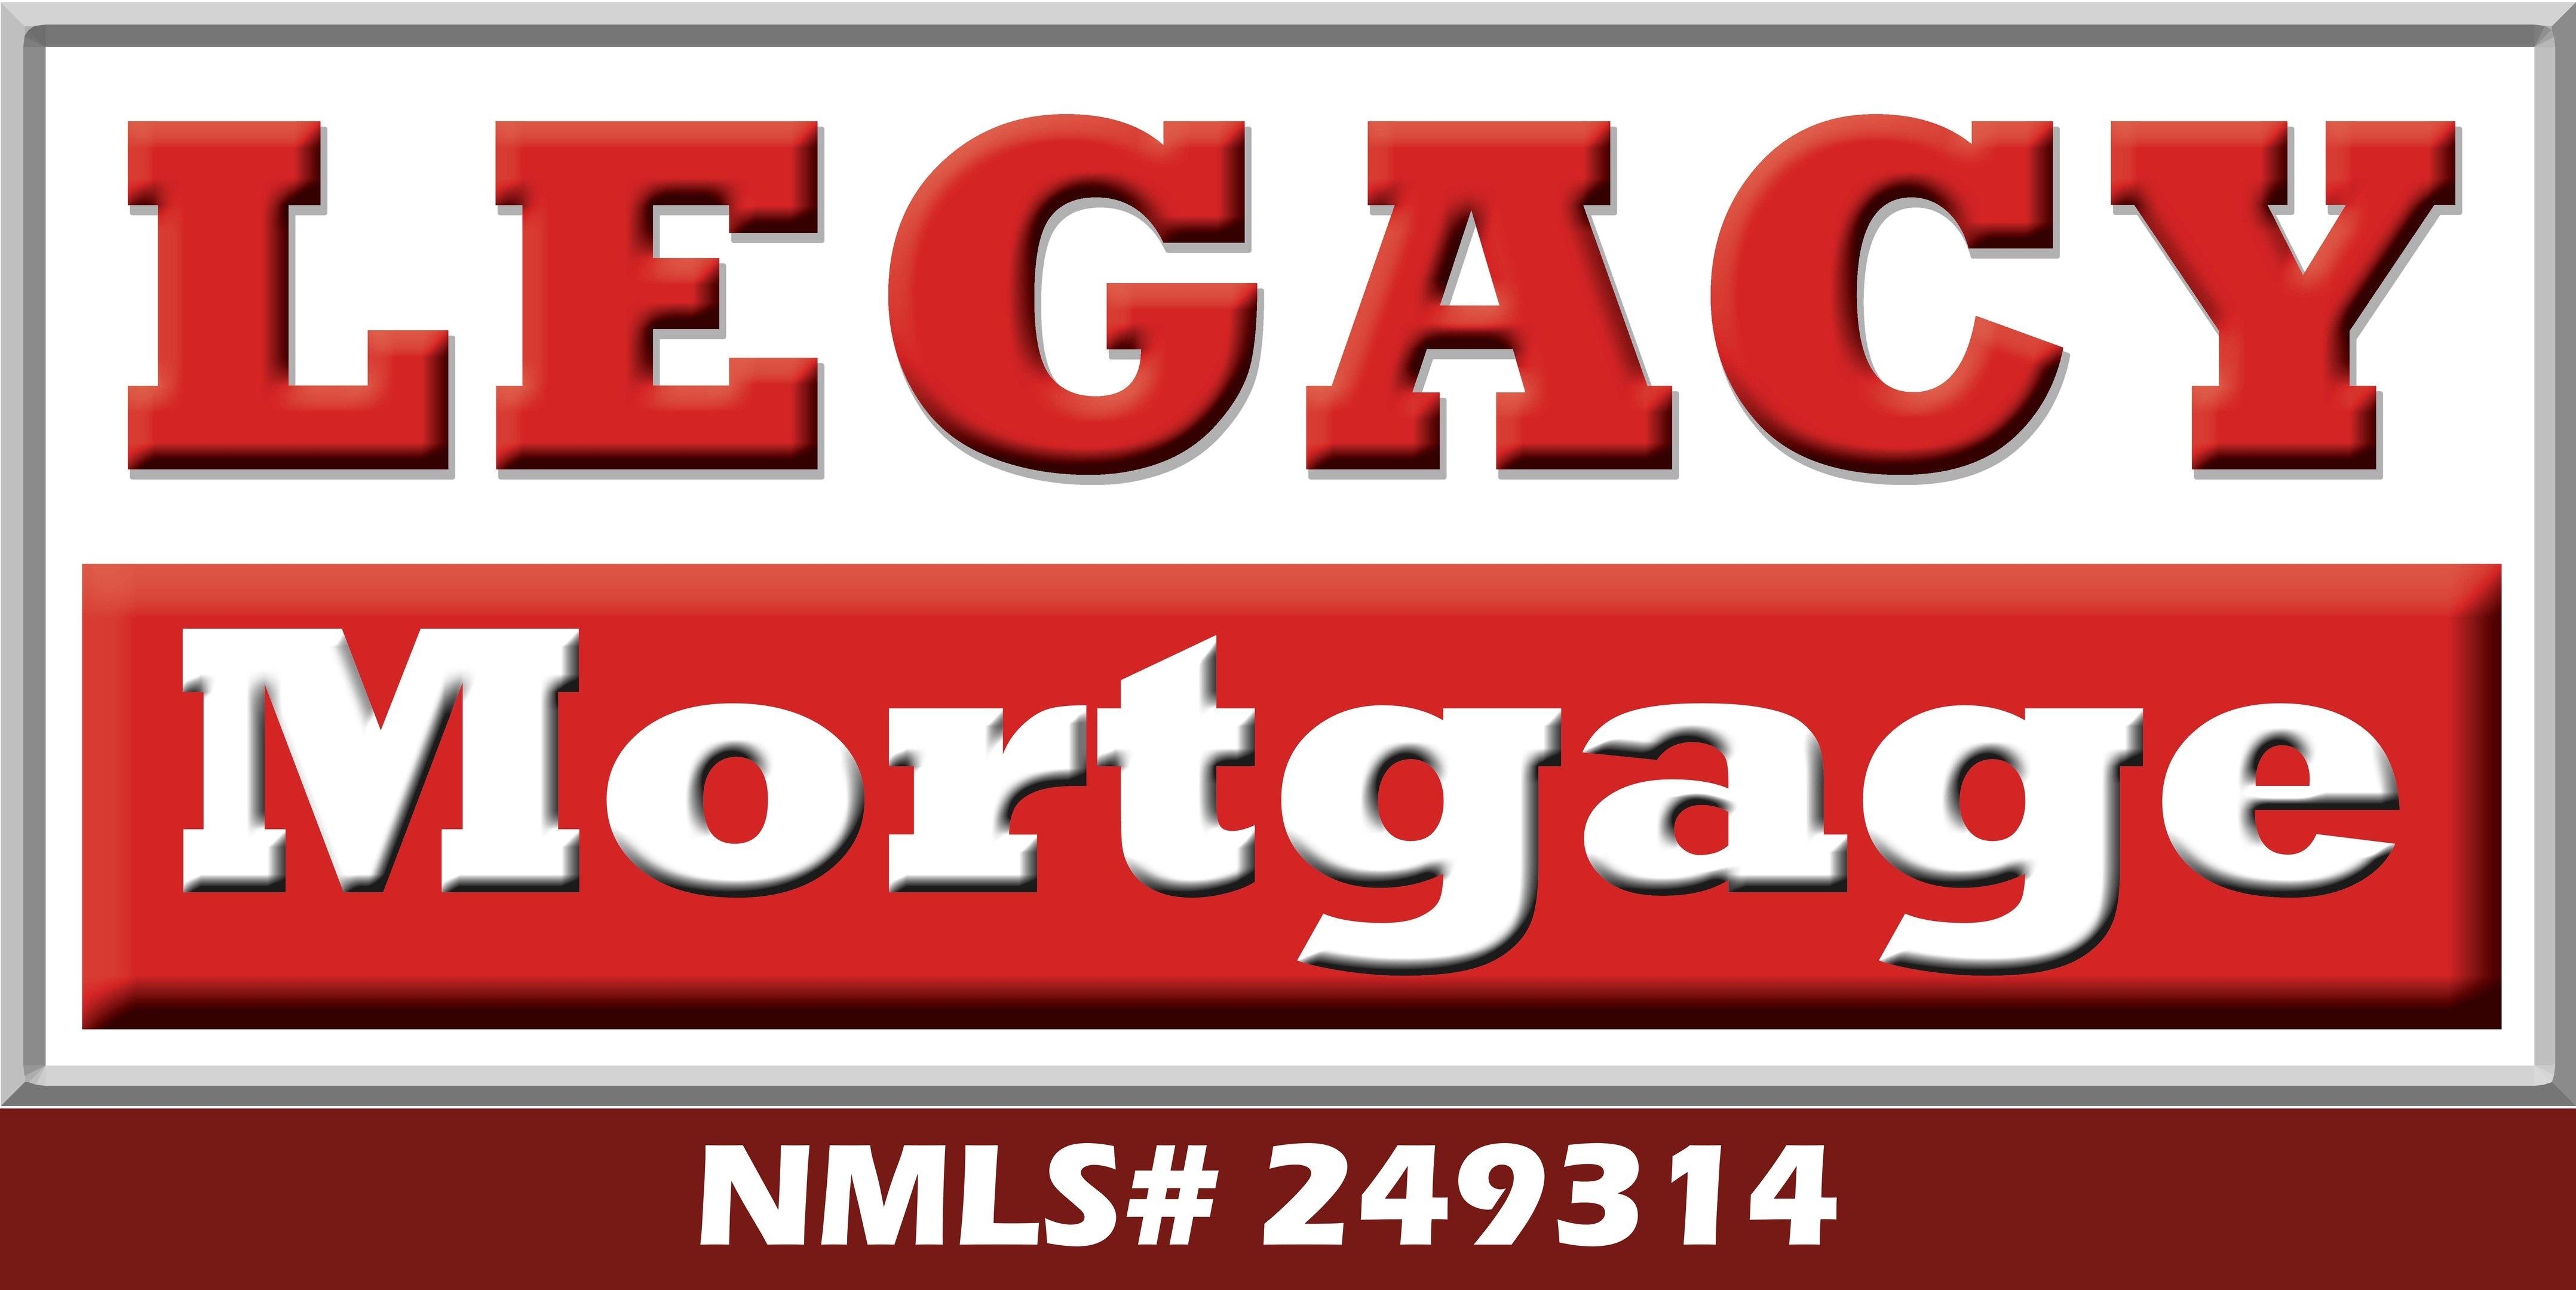 Legacy Mortgage Company